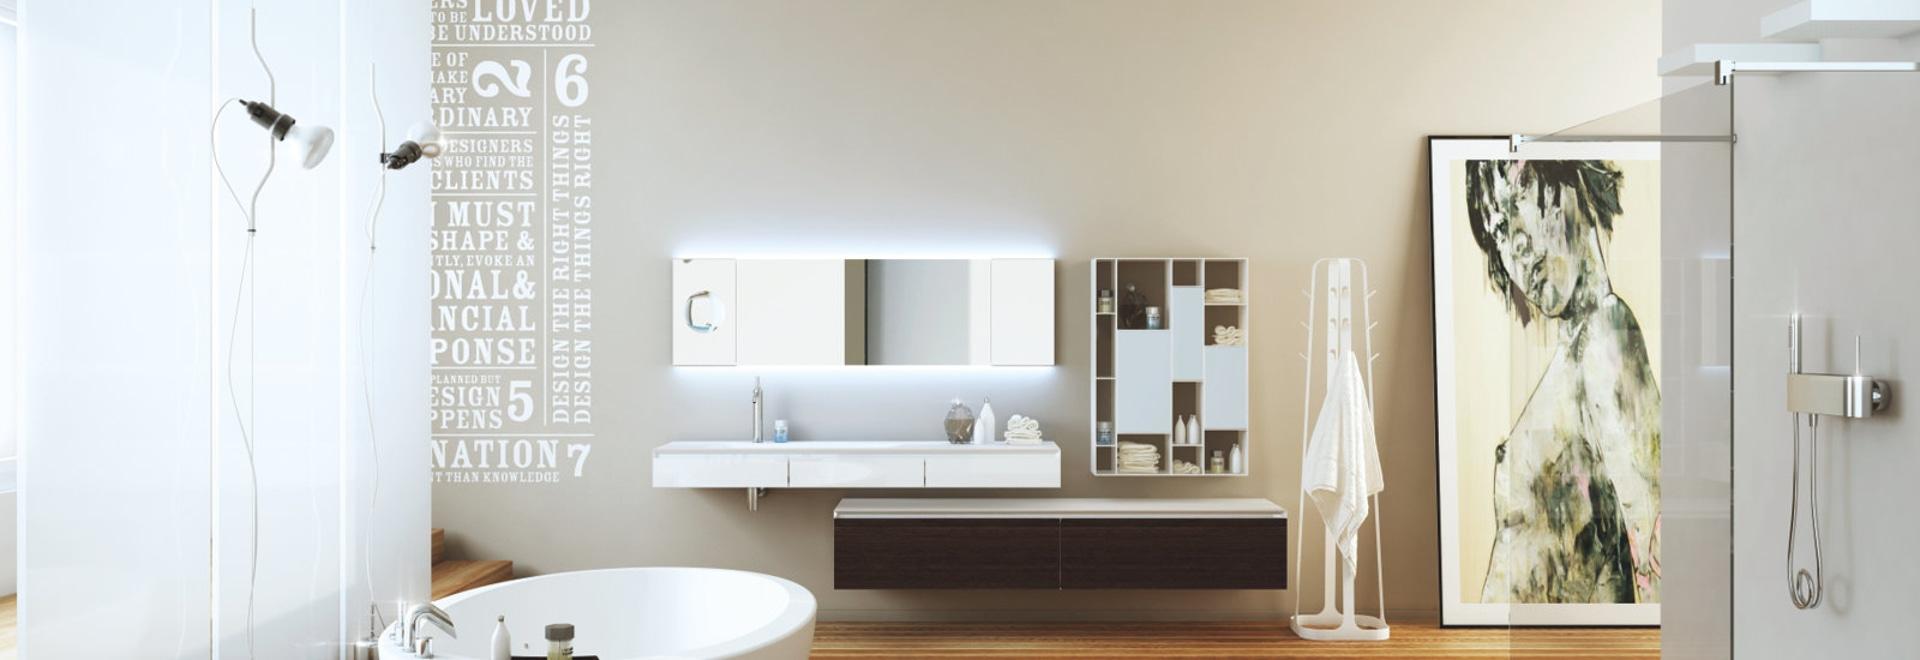 MOMA DESIGN & DIMASI BATHROOM